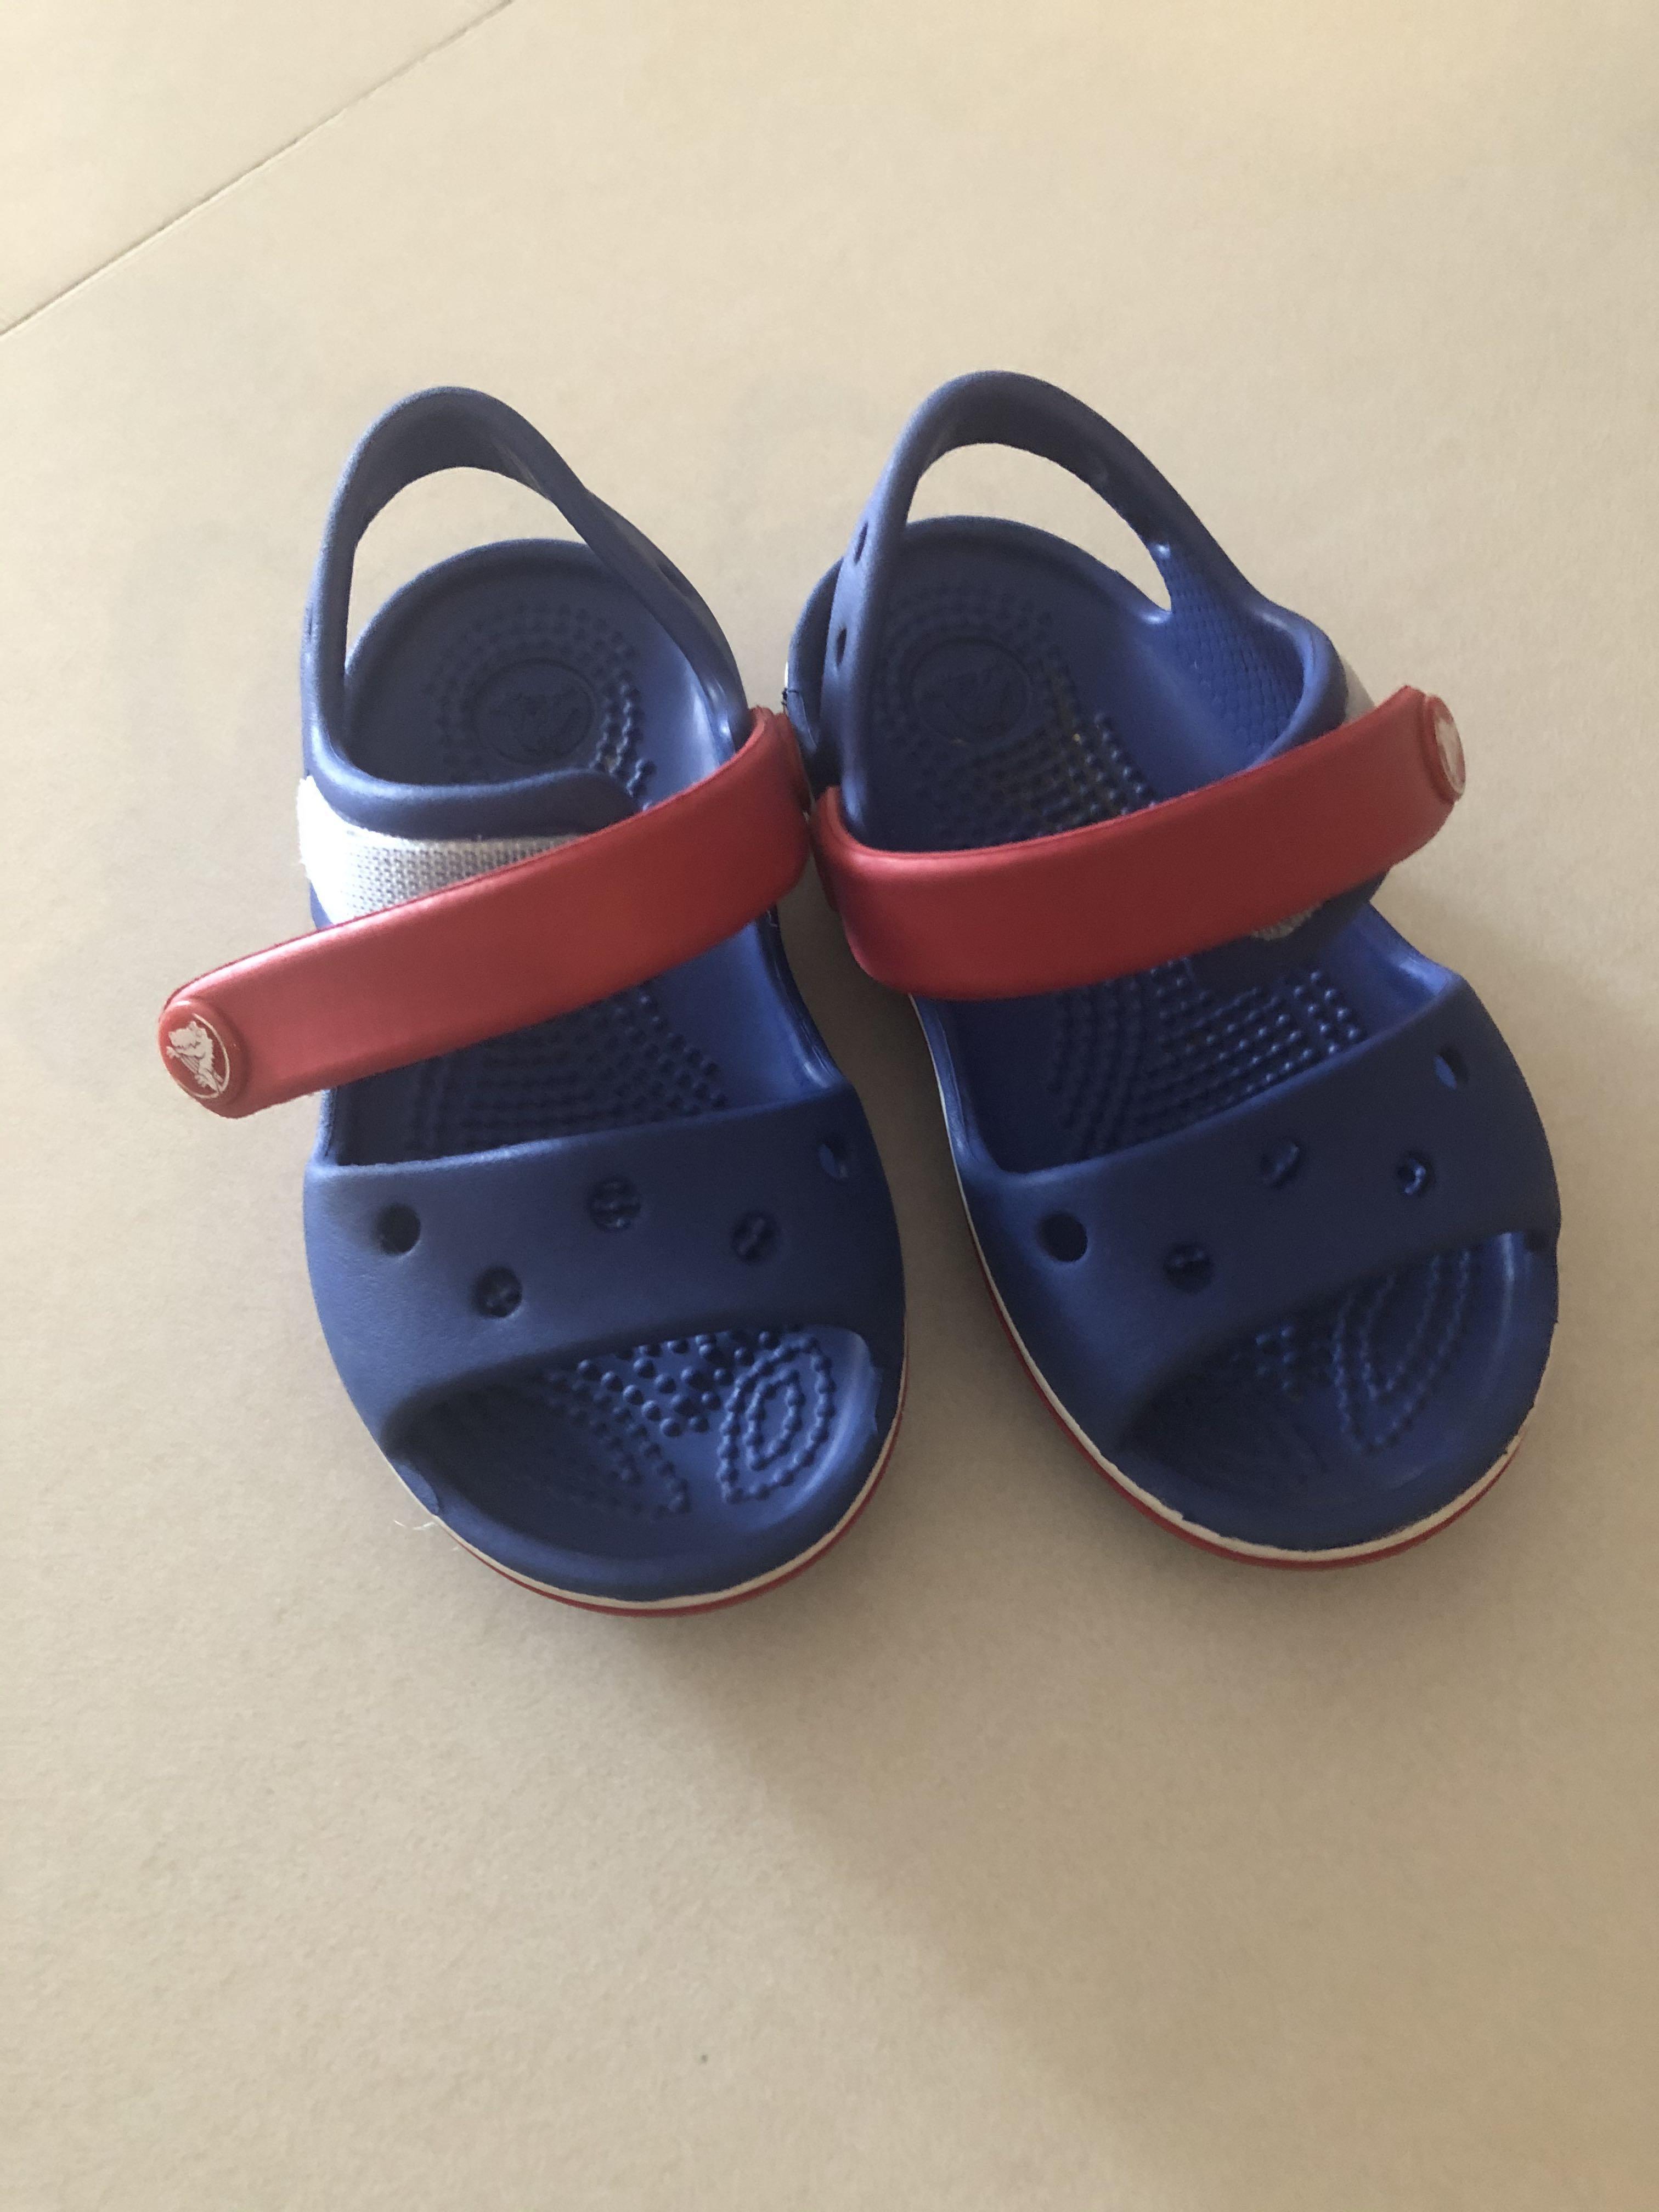 Baby kids crocs sandals size C6